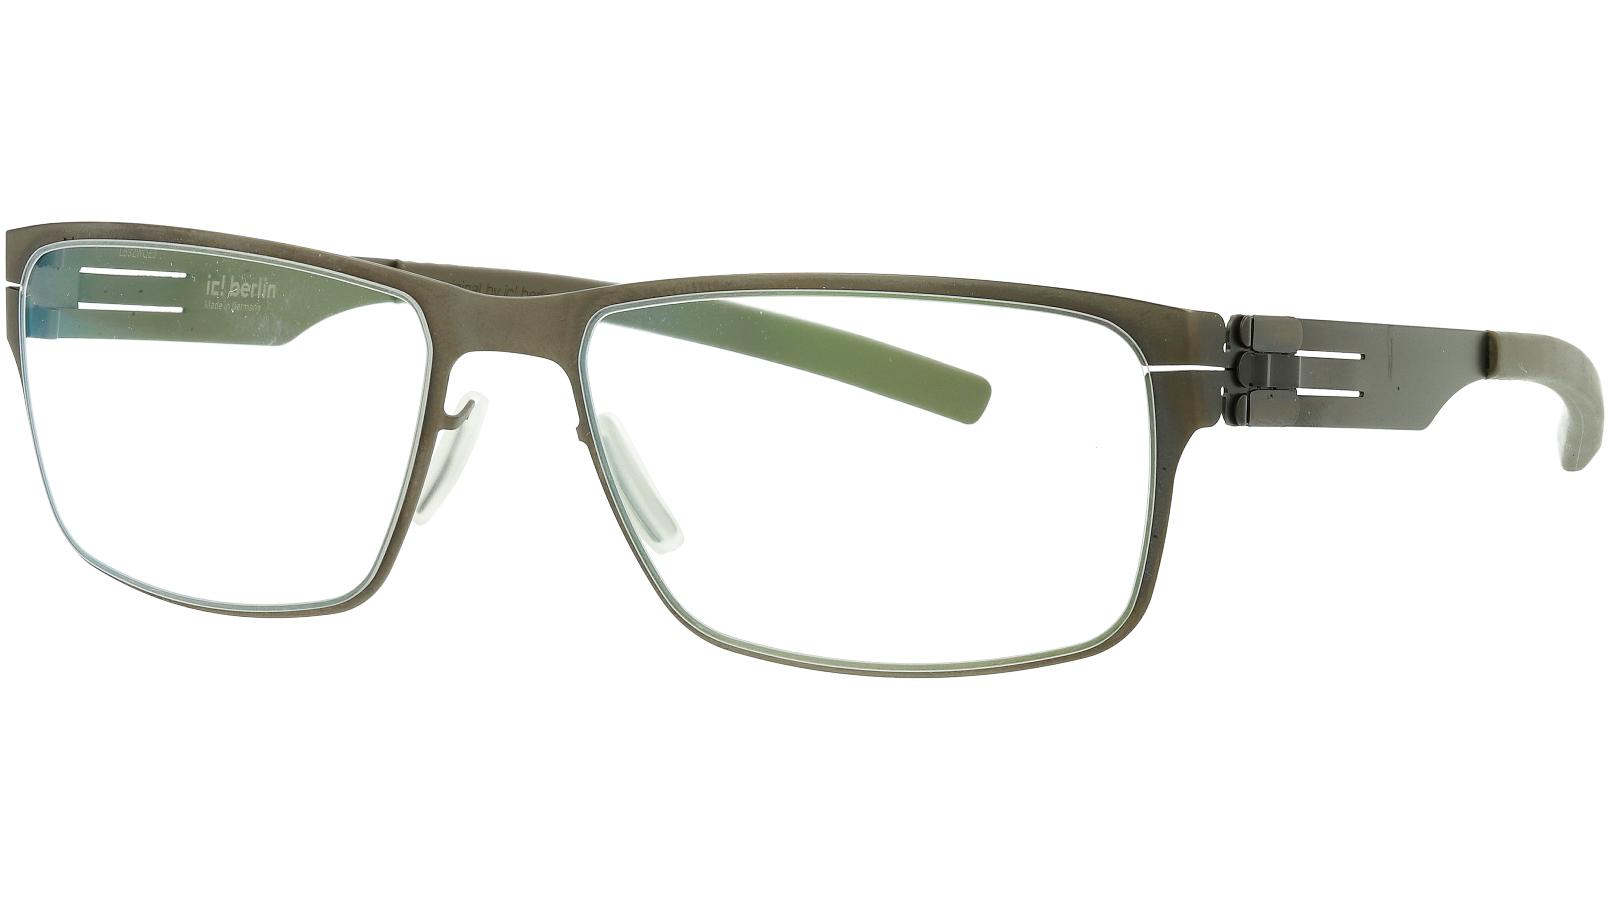 ic! Berlin Paul R. Graphite 55 Flex Glasses